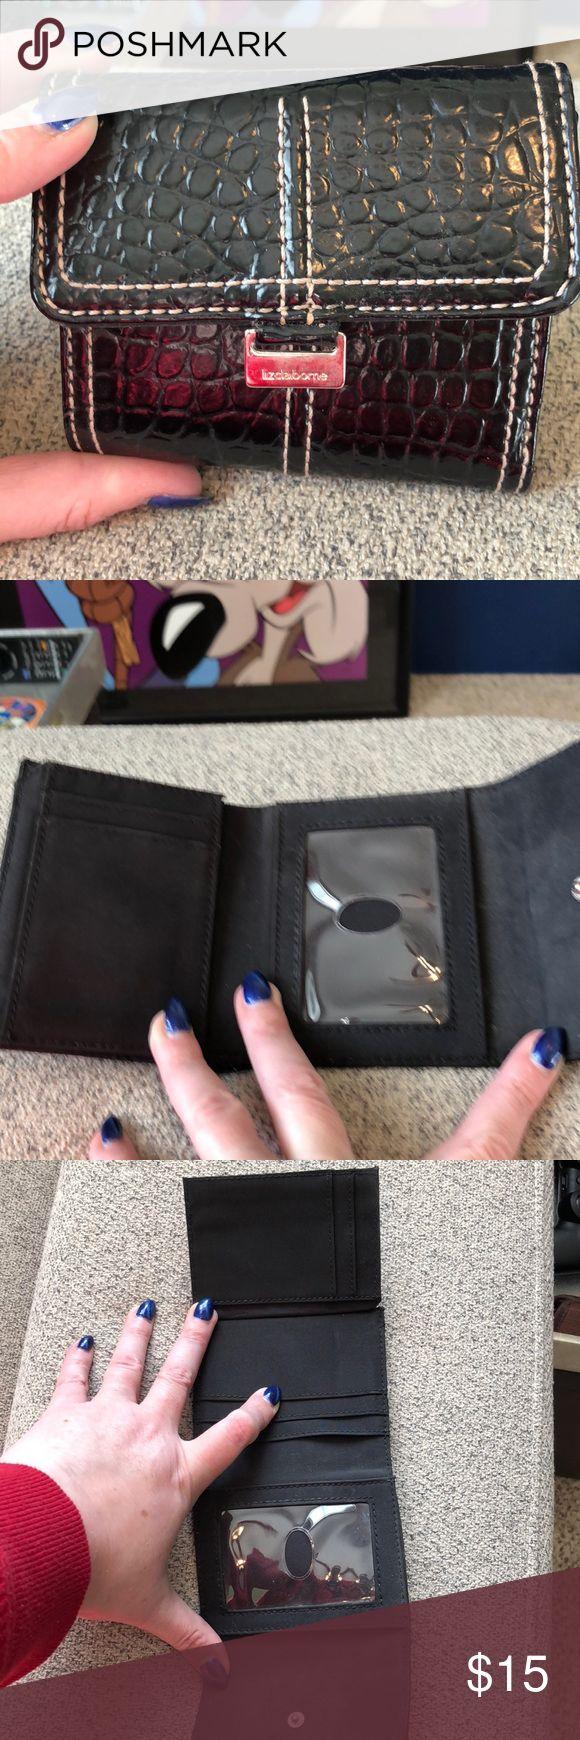 Cute expandable black pebble wallet Liz Claiborne  Cute expandable black pebble wallet Liz Claiborne Bags Wallets